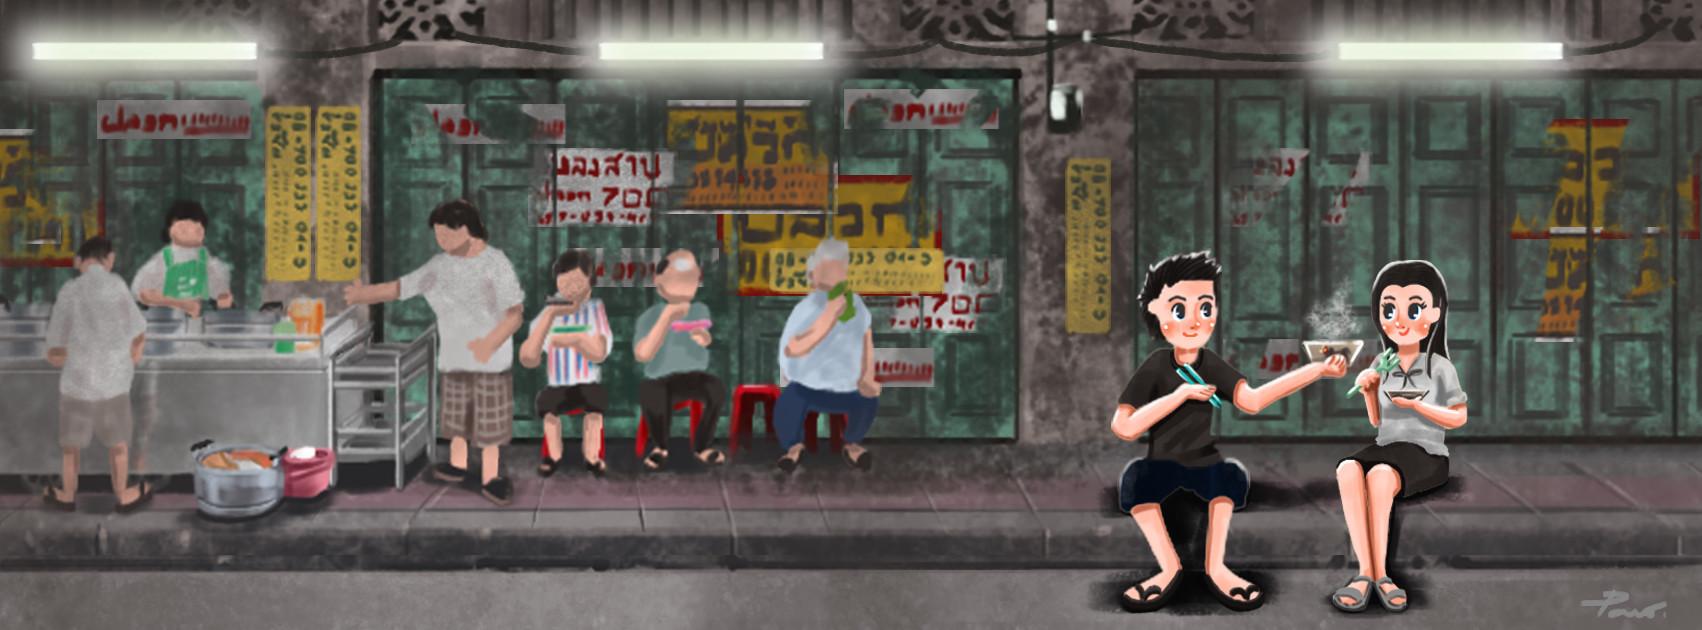 Malaink s chinatown